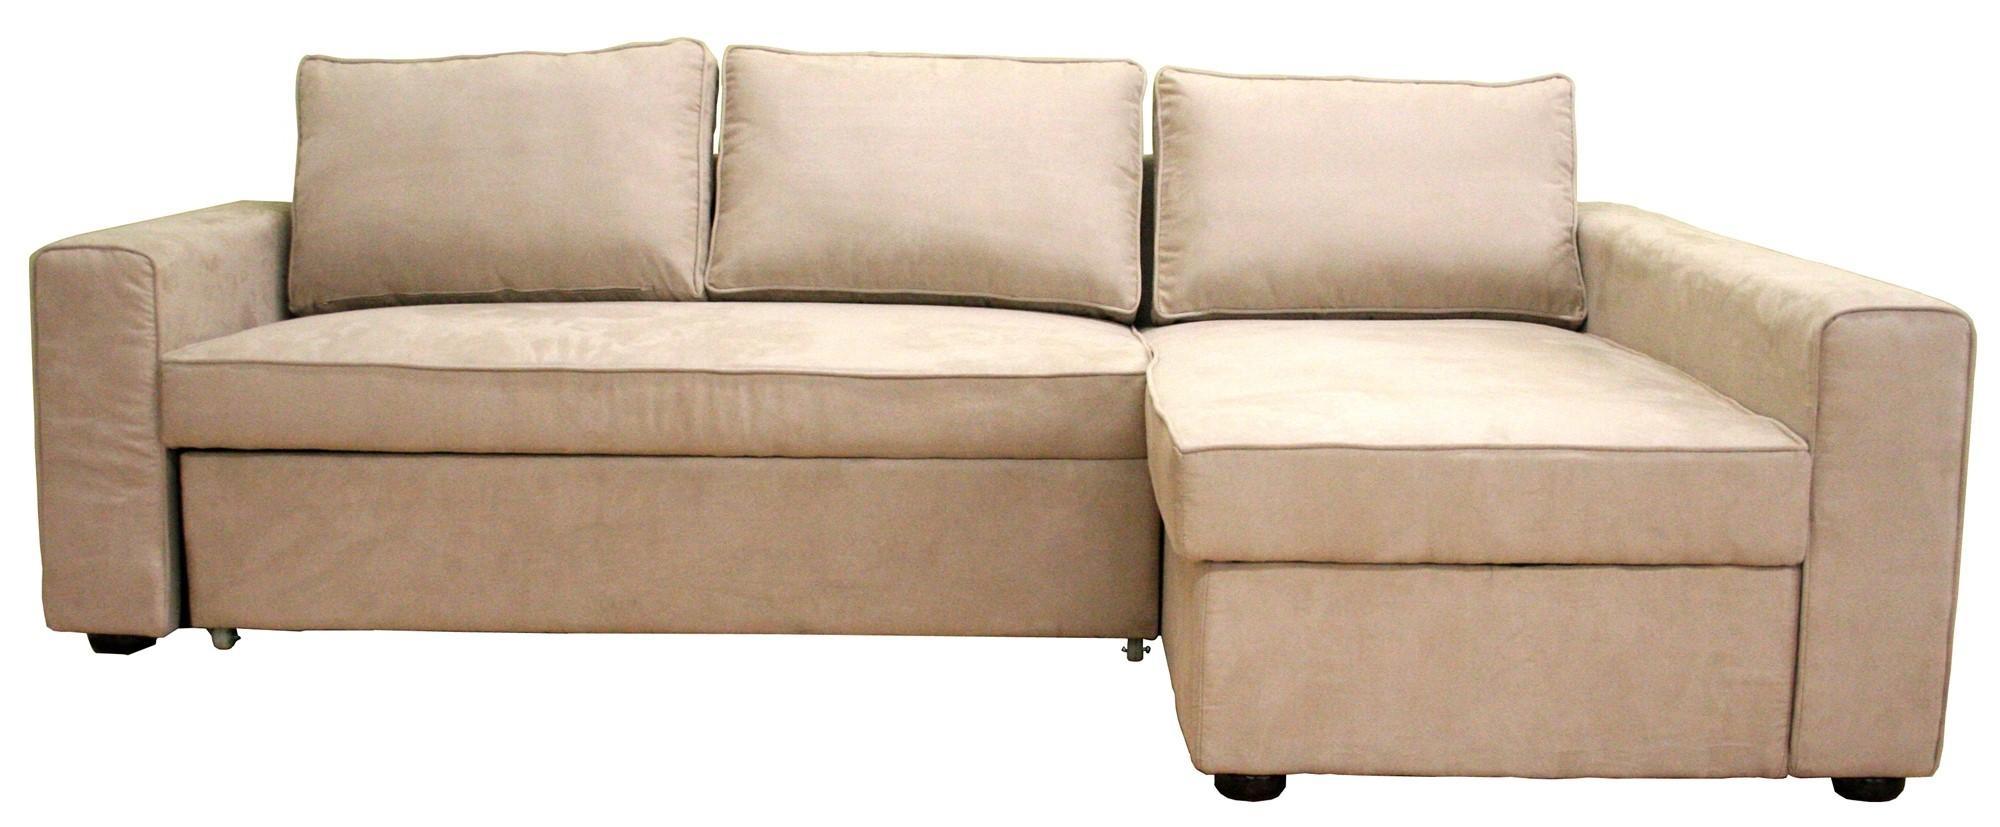 cindy crawford denim sofa sleeper cb2 flex frost 20 collection of sofas ideas